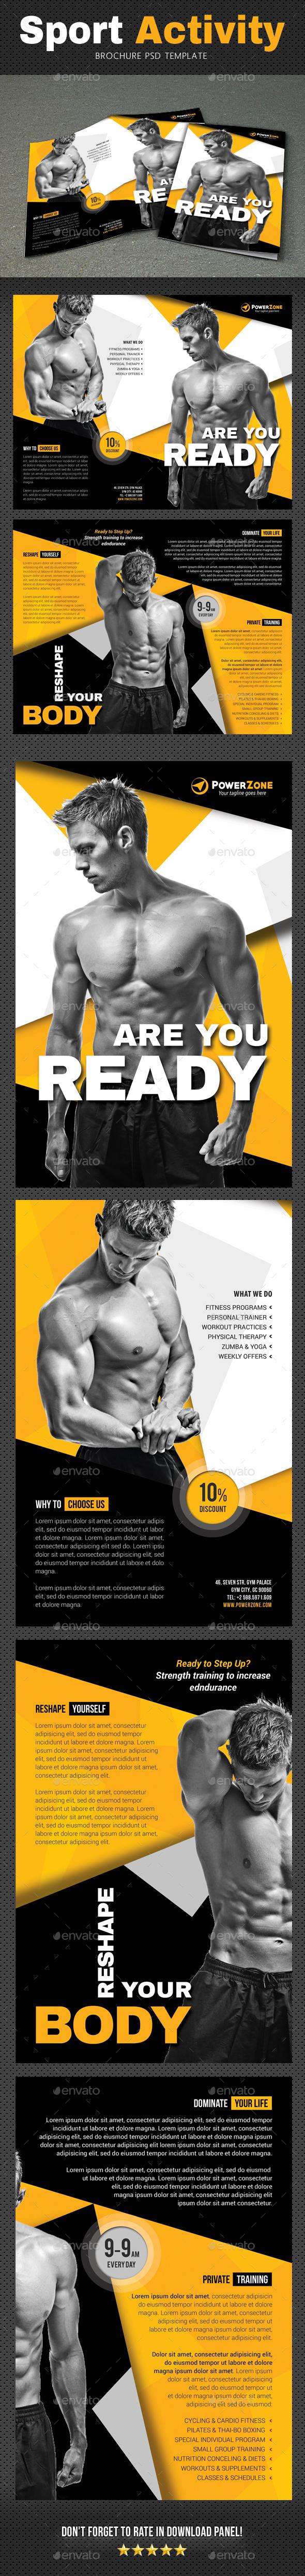 Sport Activity Brochure 6 - Brochures Print Templates